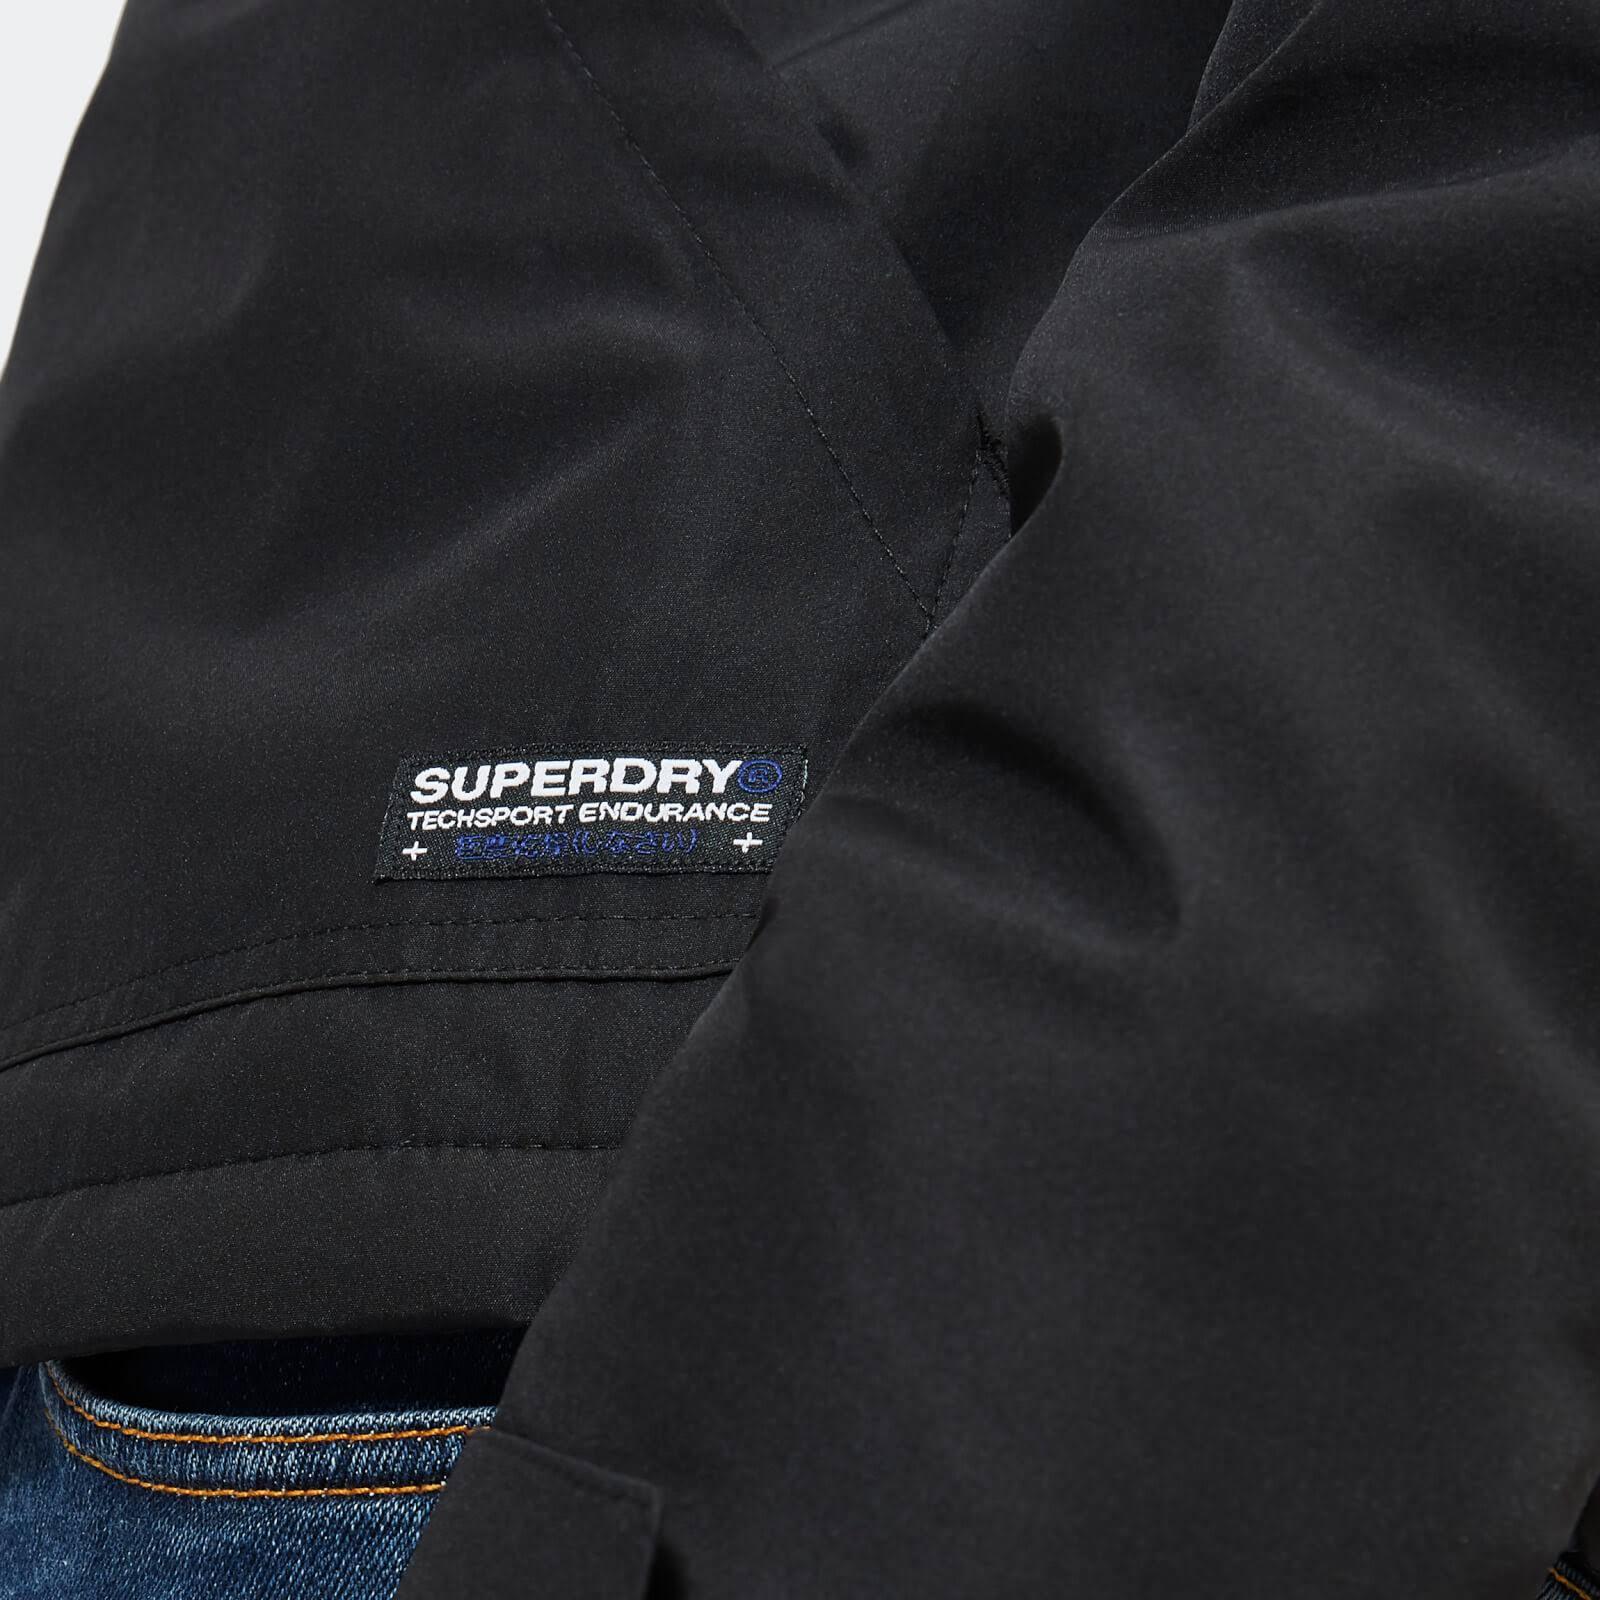 Color Talla Hombre Acolchada Elite L Negro Sd Para Superdry Chaqueta Y8wXpp